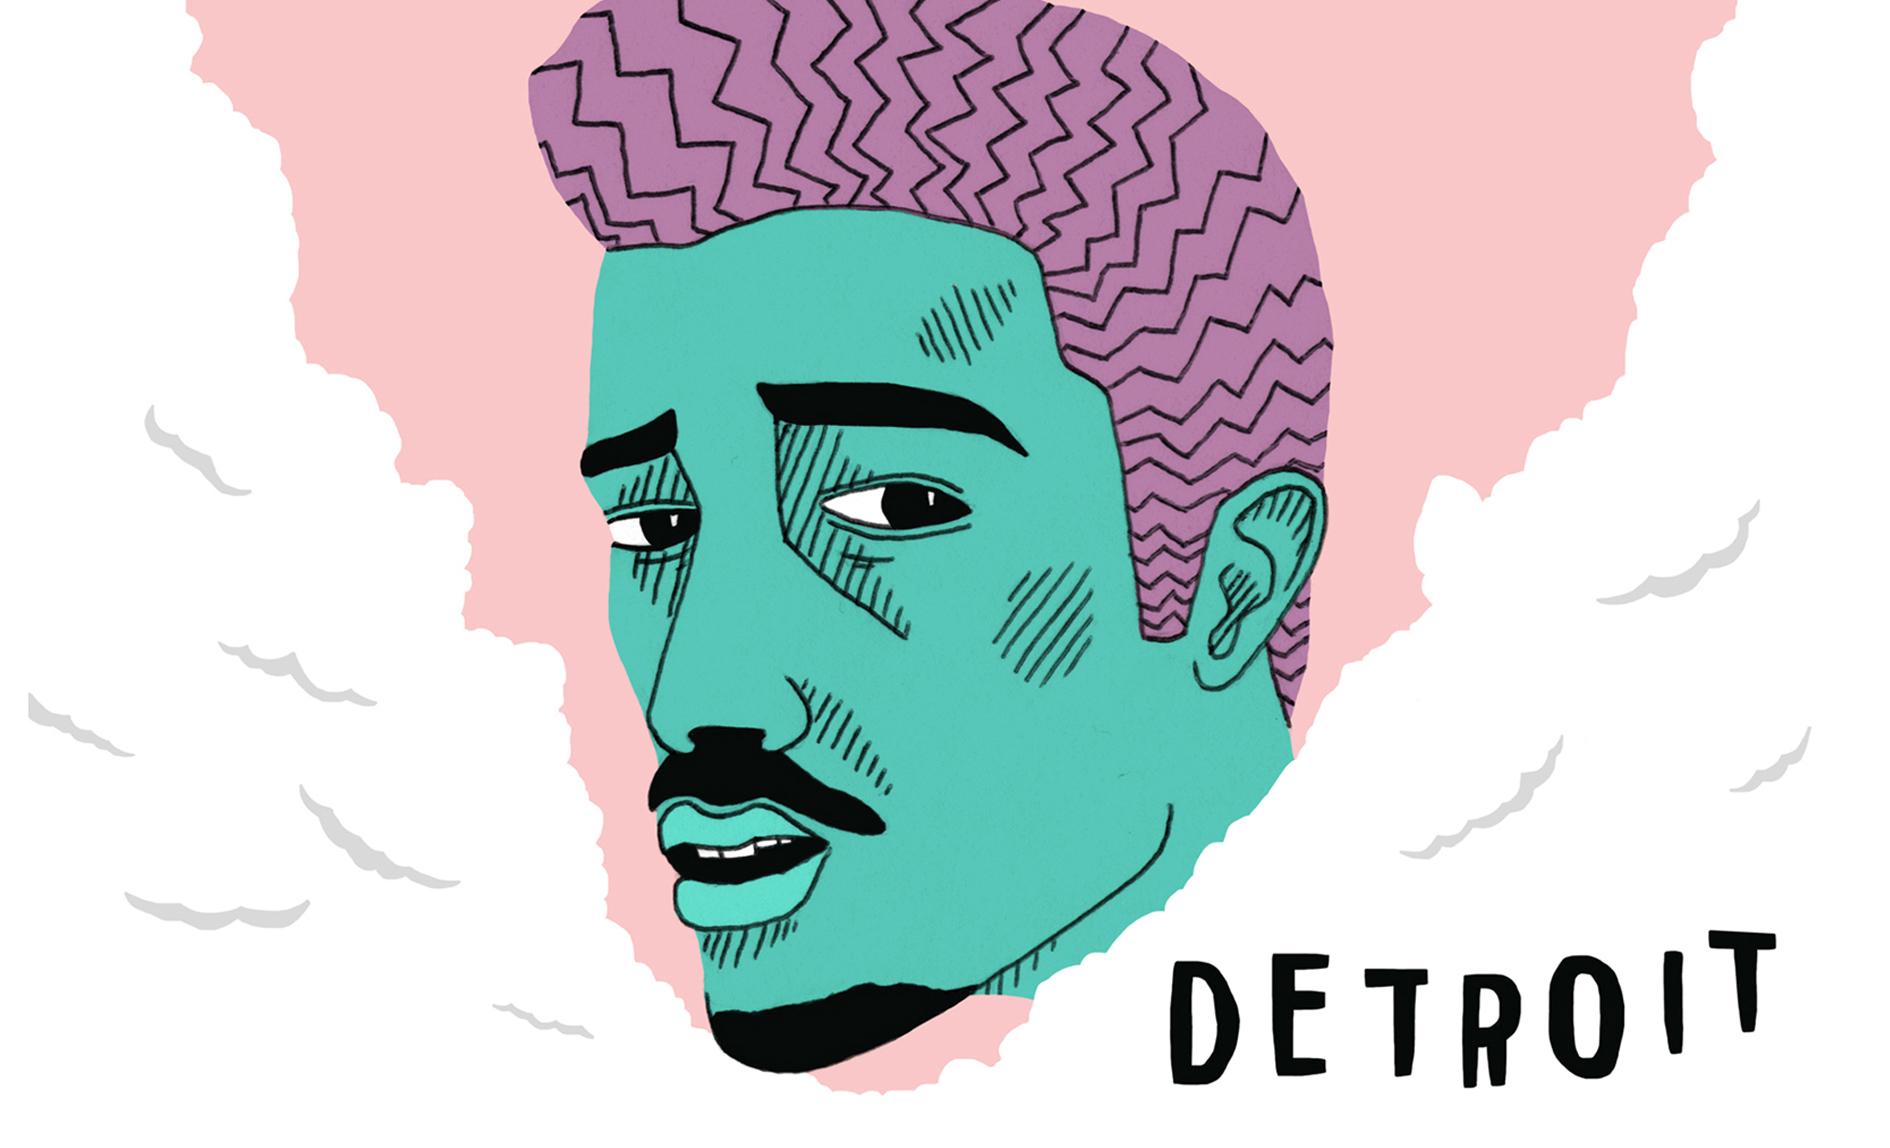 Cover image: Detroit